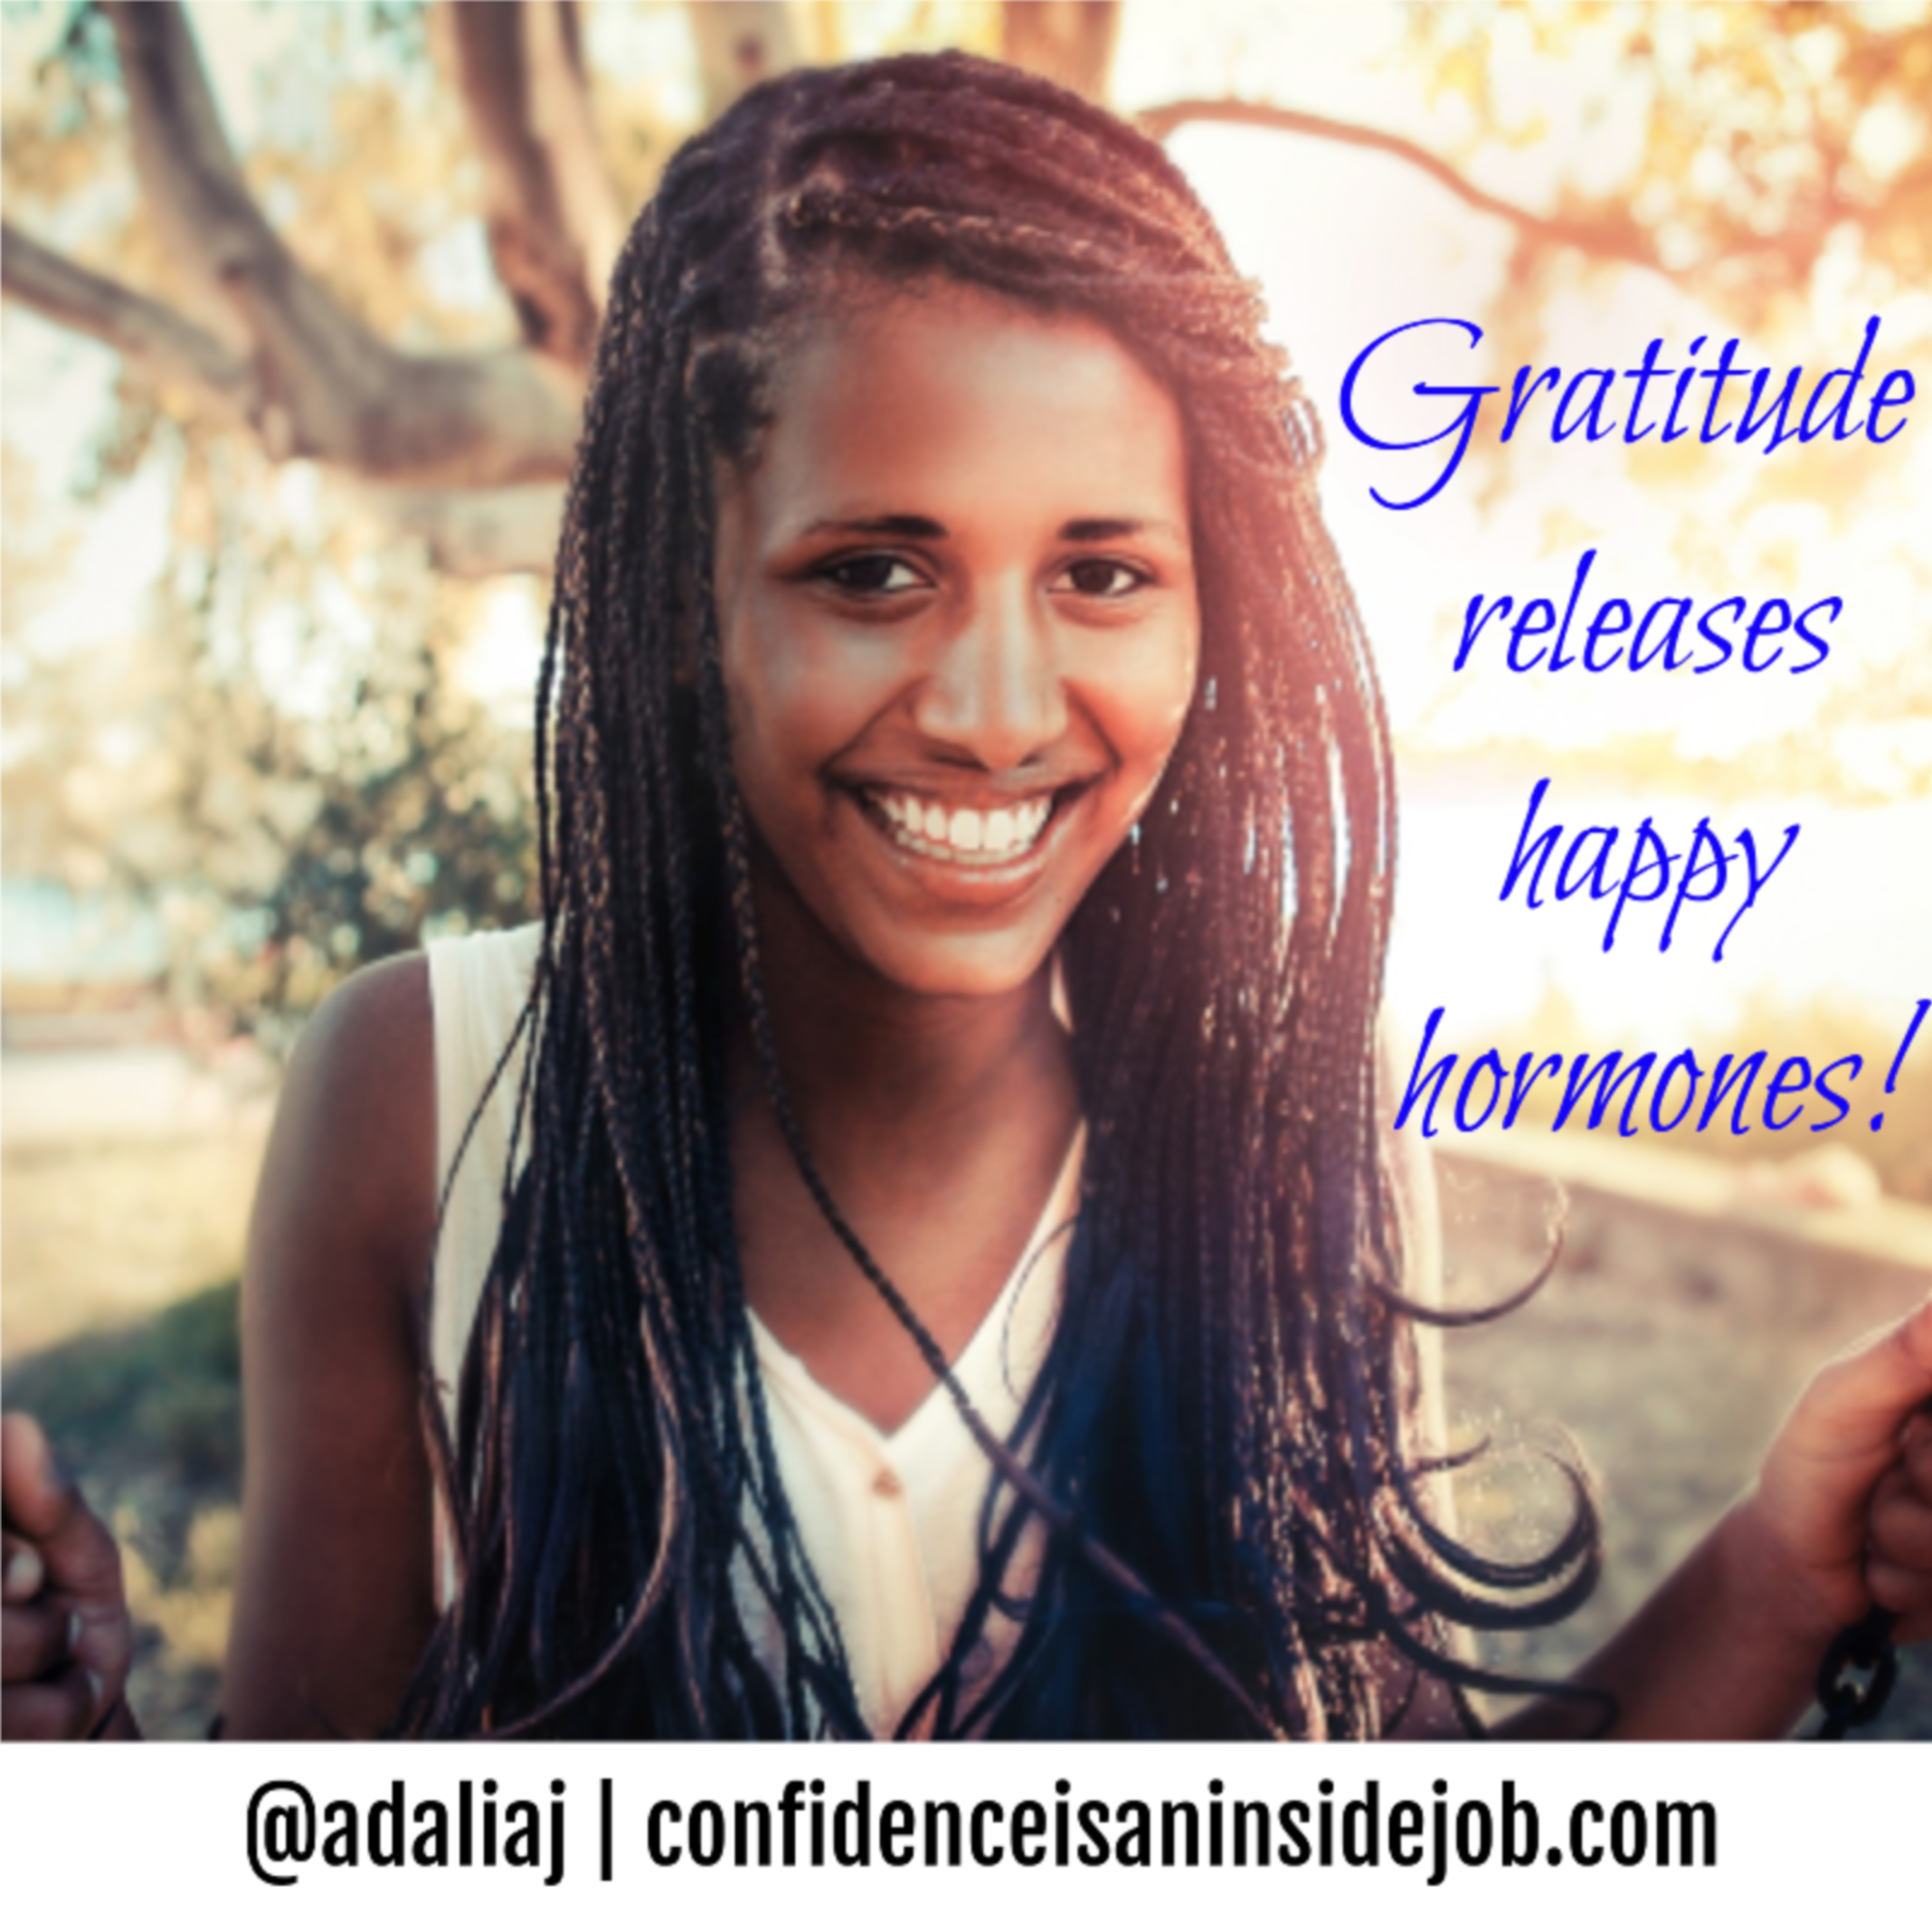 Gratitude: 30 Ways to Practice Daily Gratitude